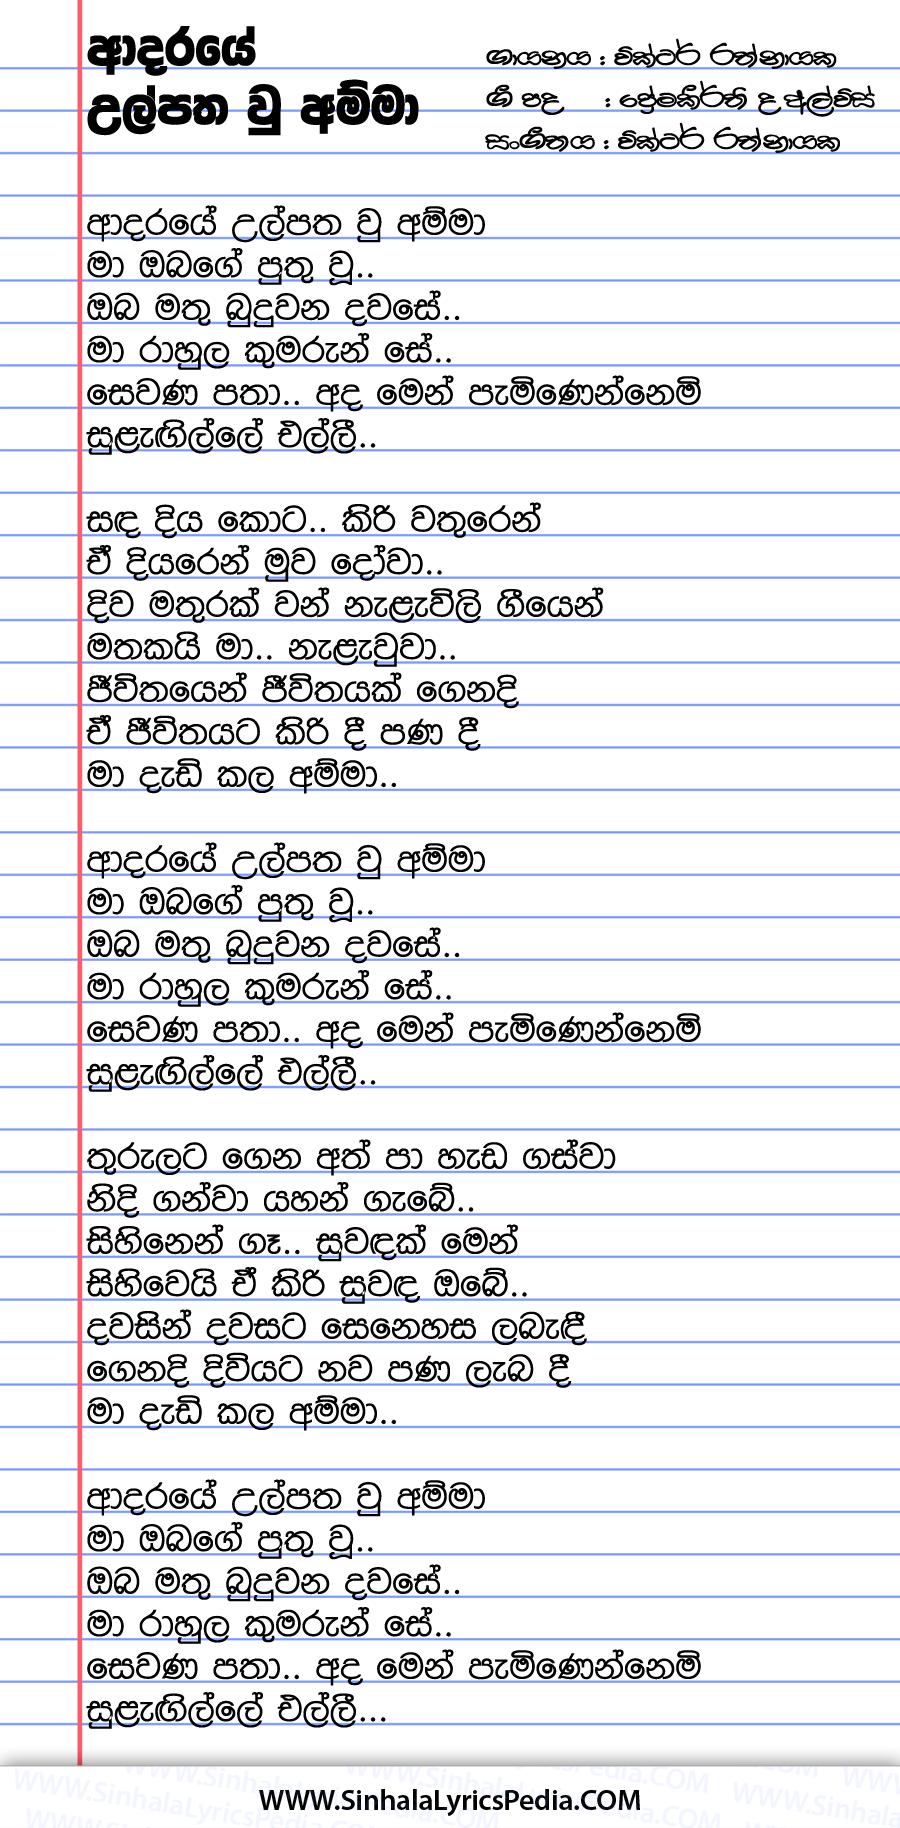 Adaraye Ulpatha Wu Amma Song Lyrics